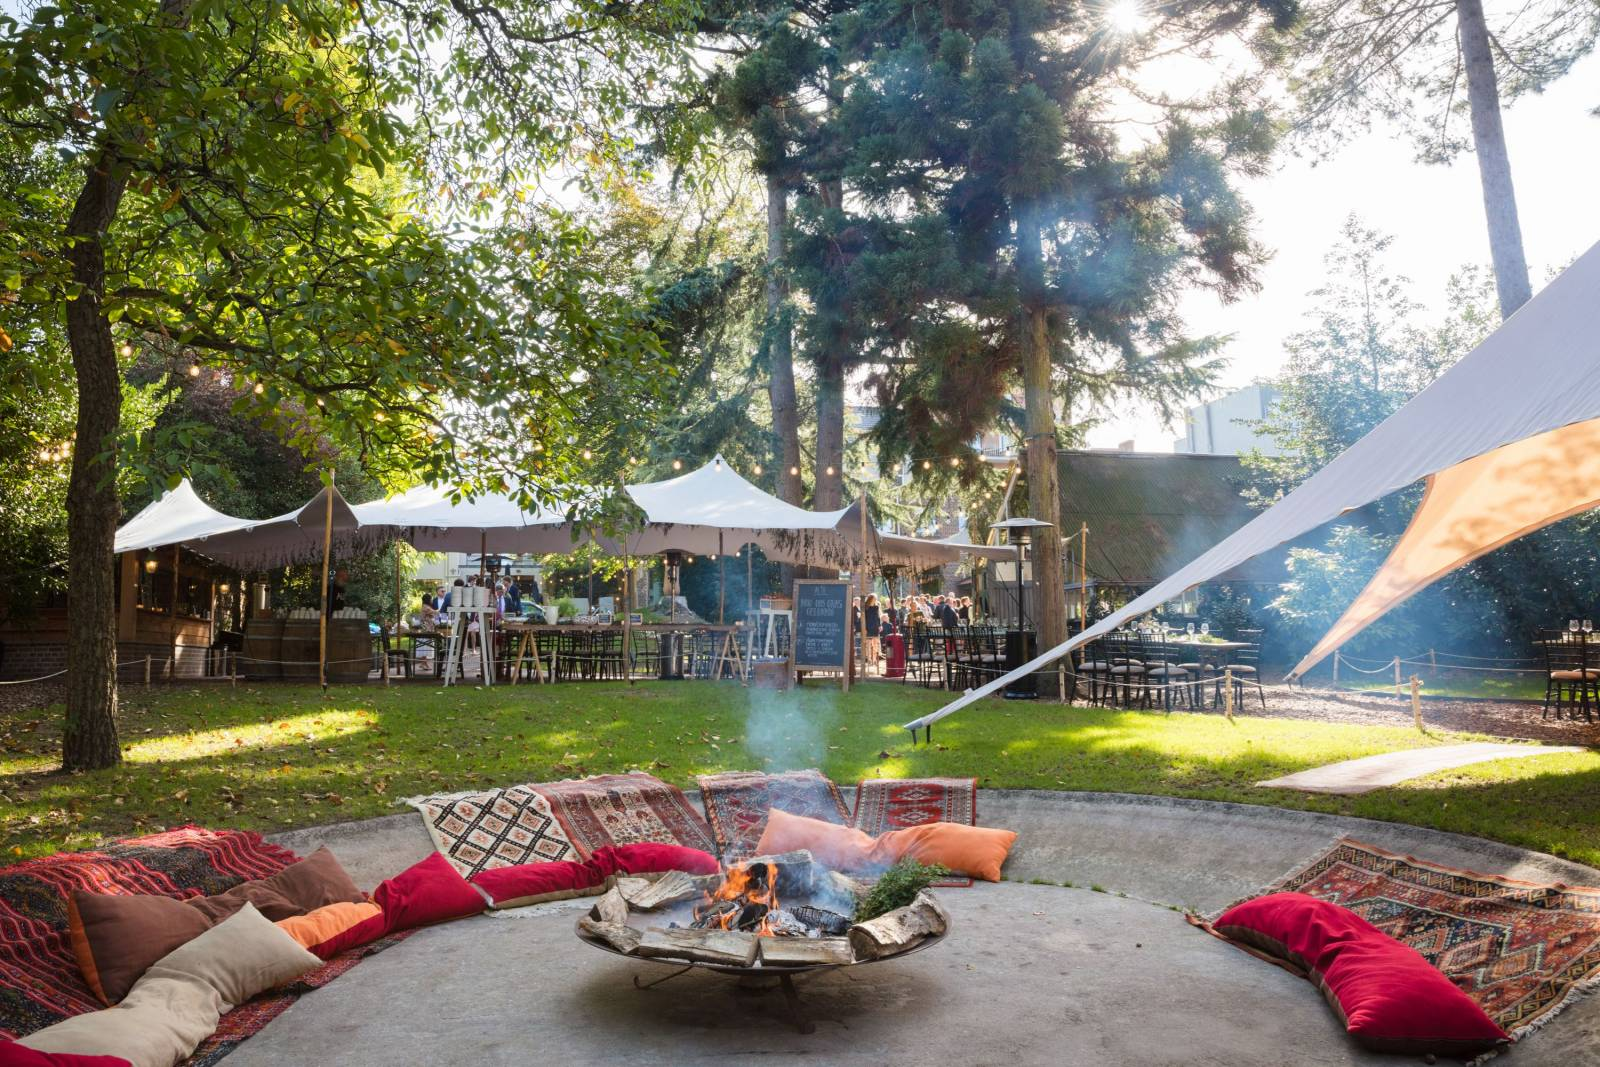 Alix - Table & Jardin d'Amis - Feestzaal - Feesttuin - House of Weddings - 7